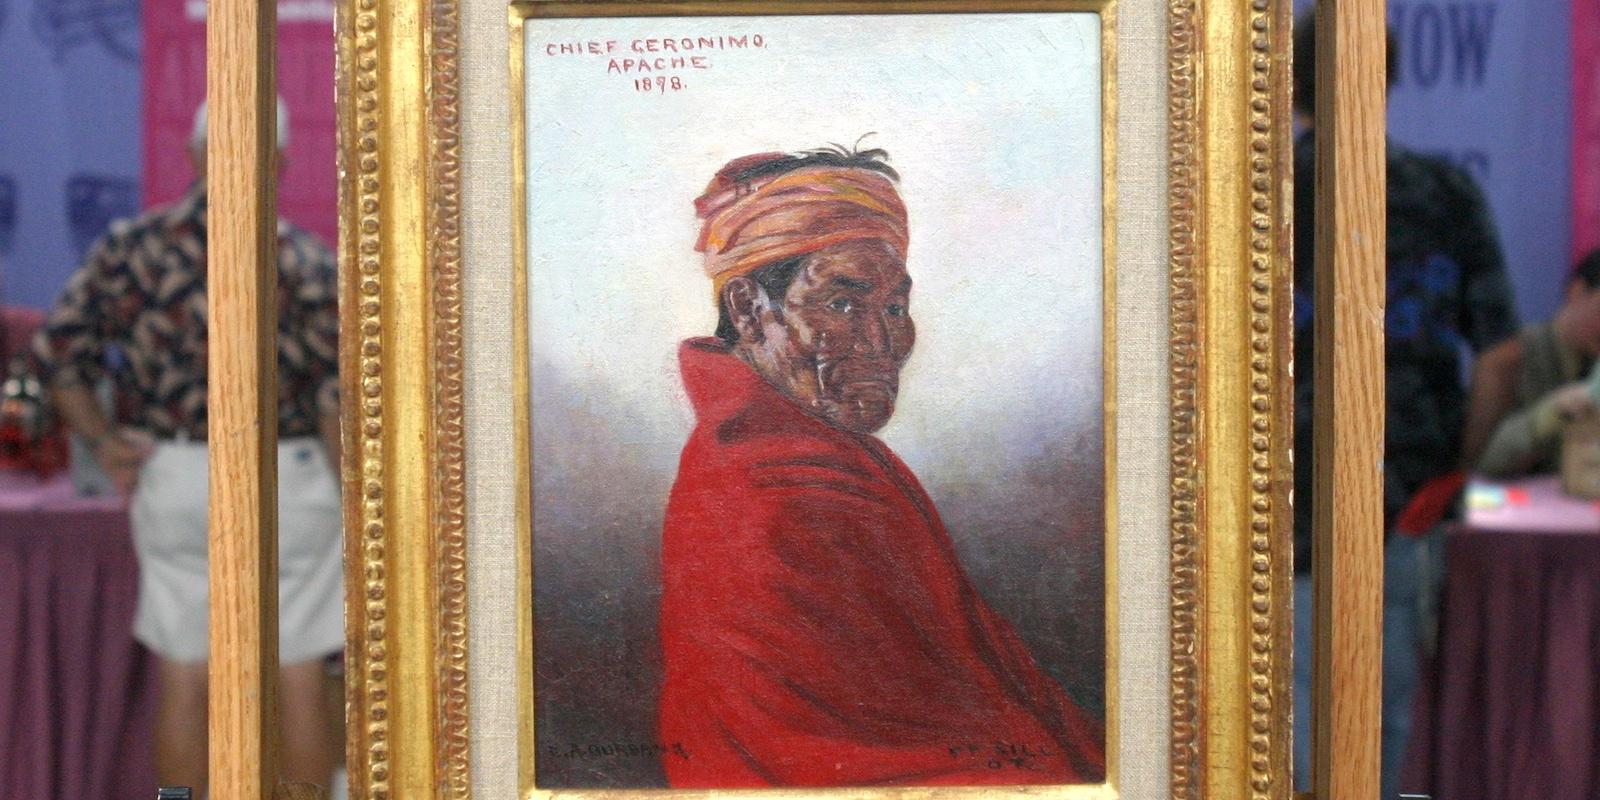 http://www-tc.pbs.org/prod-media/antiques-roadshow/article/images/Geronimo_AR-OKC-808-1600x800.jpg